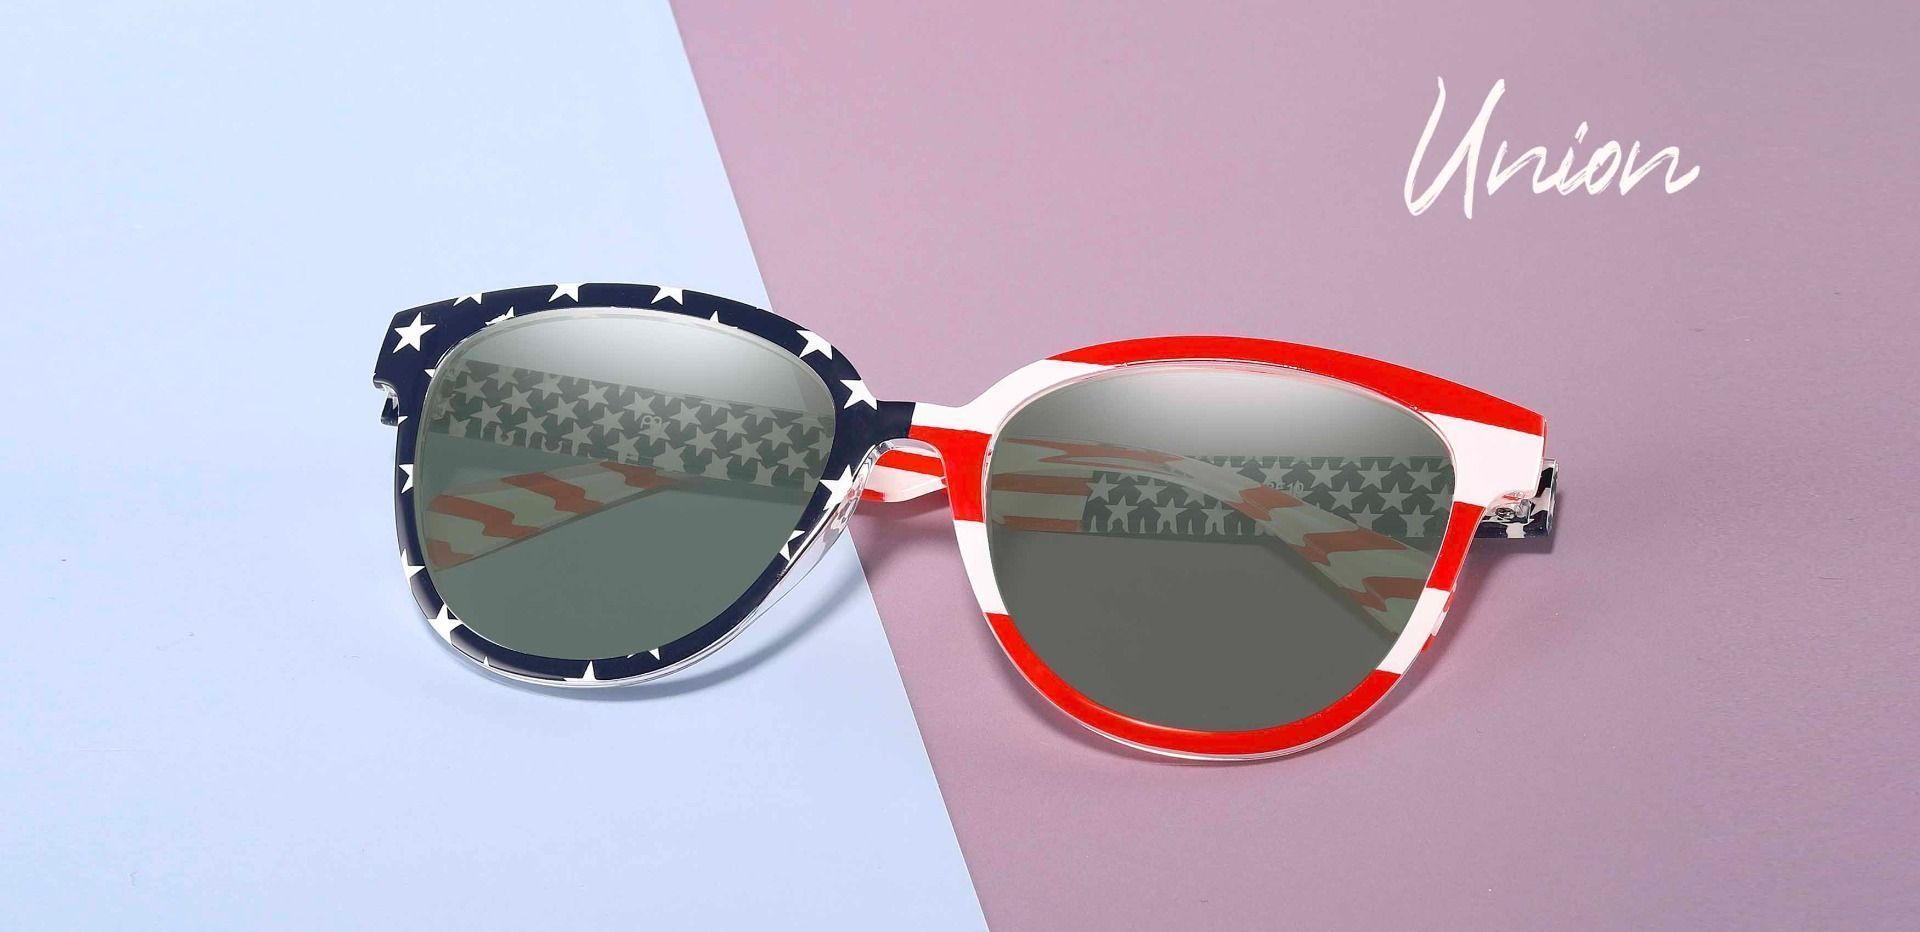 Union Square Progressive Sunglasses - Floral Frame With Green Lenses